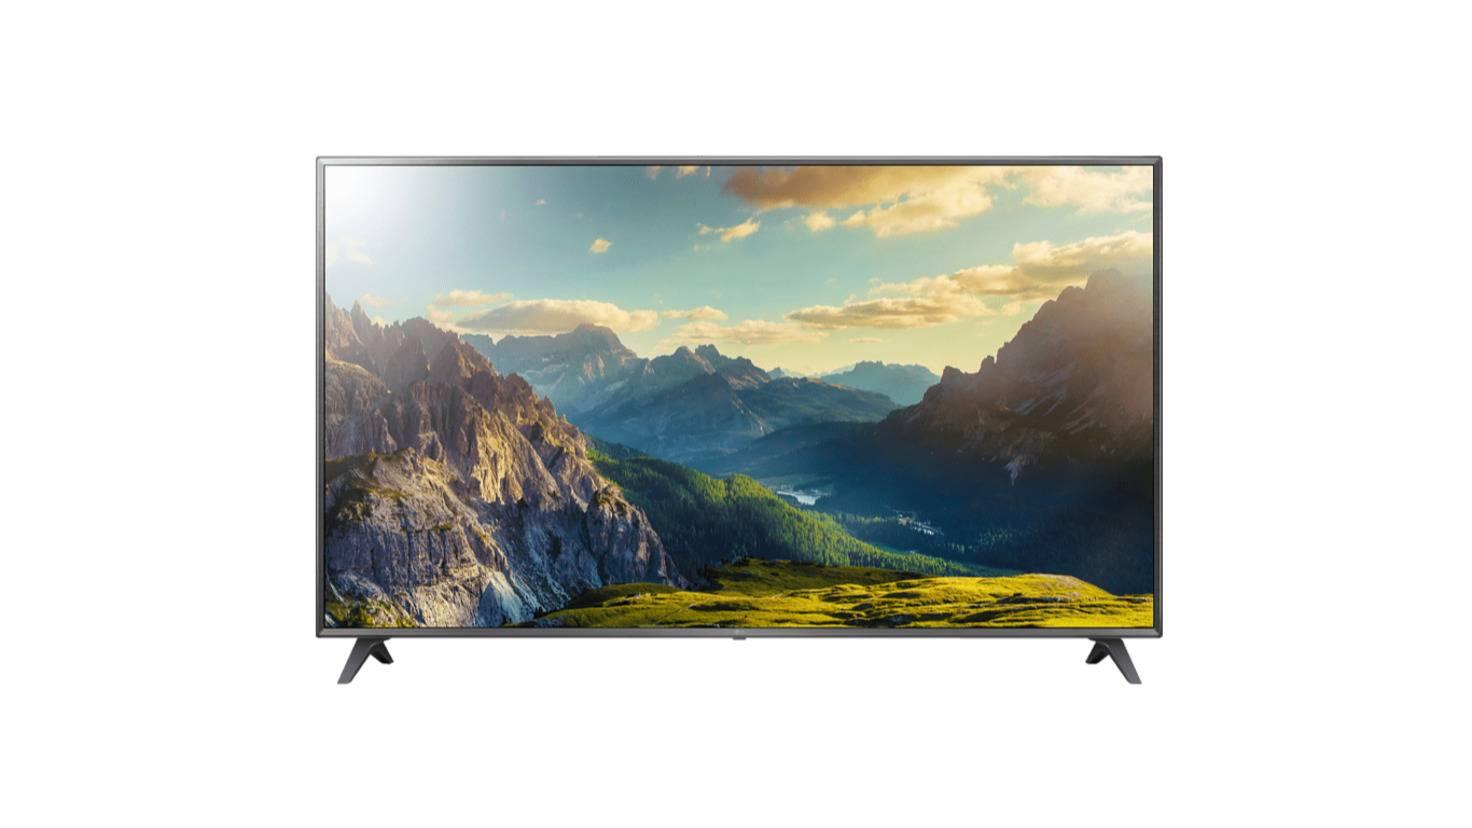 lg-75uk6200-tv-fernseher